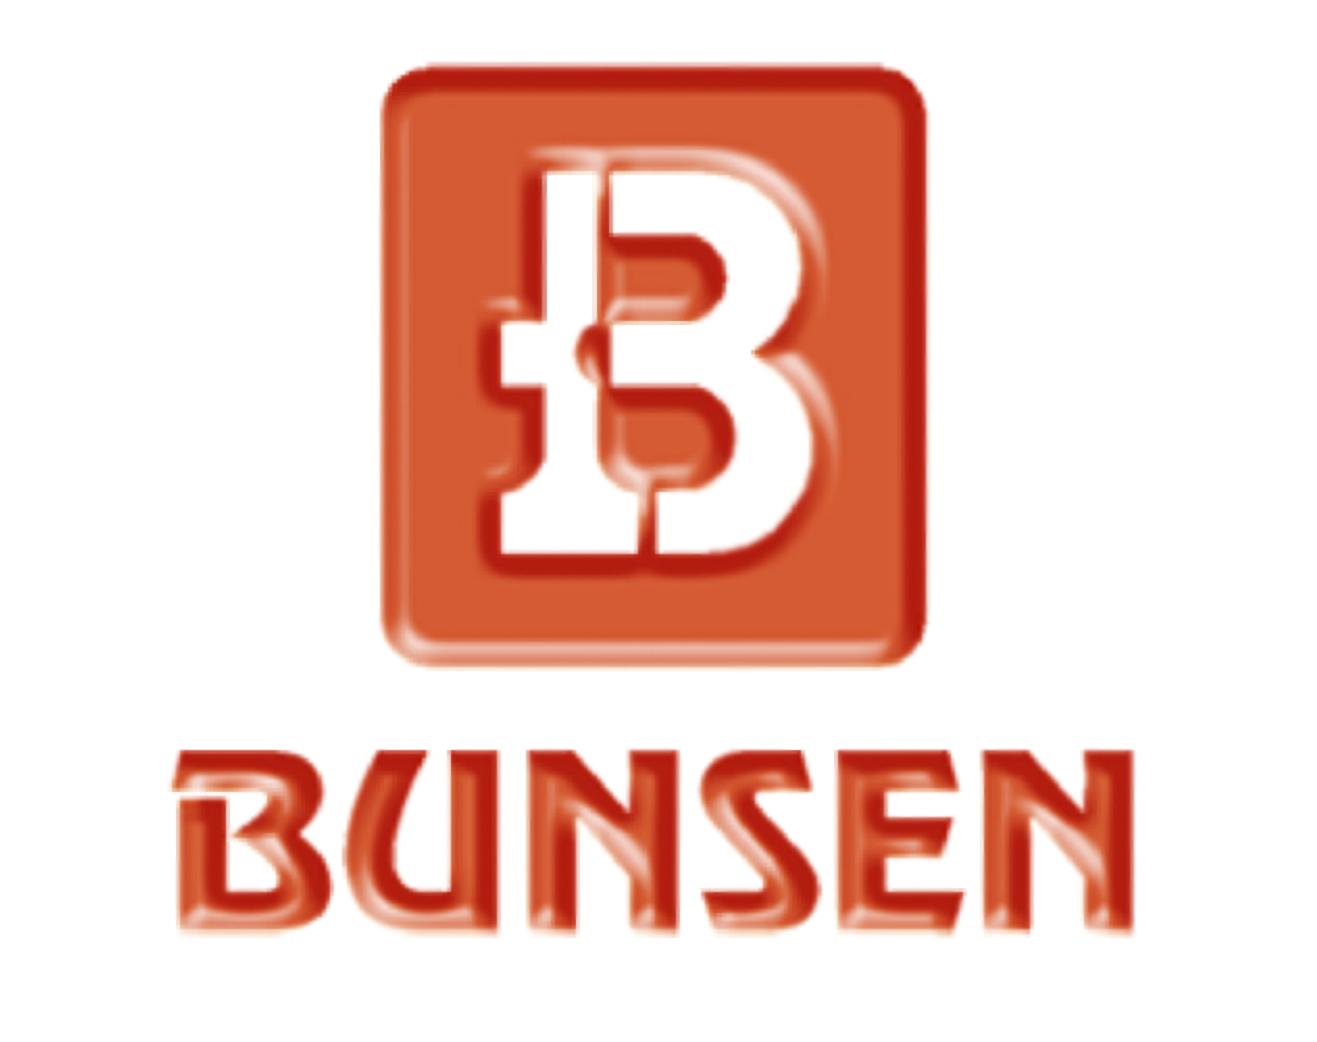 Bunsen